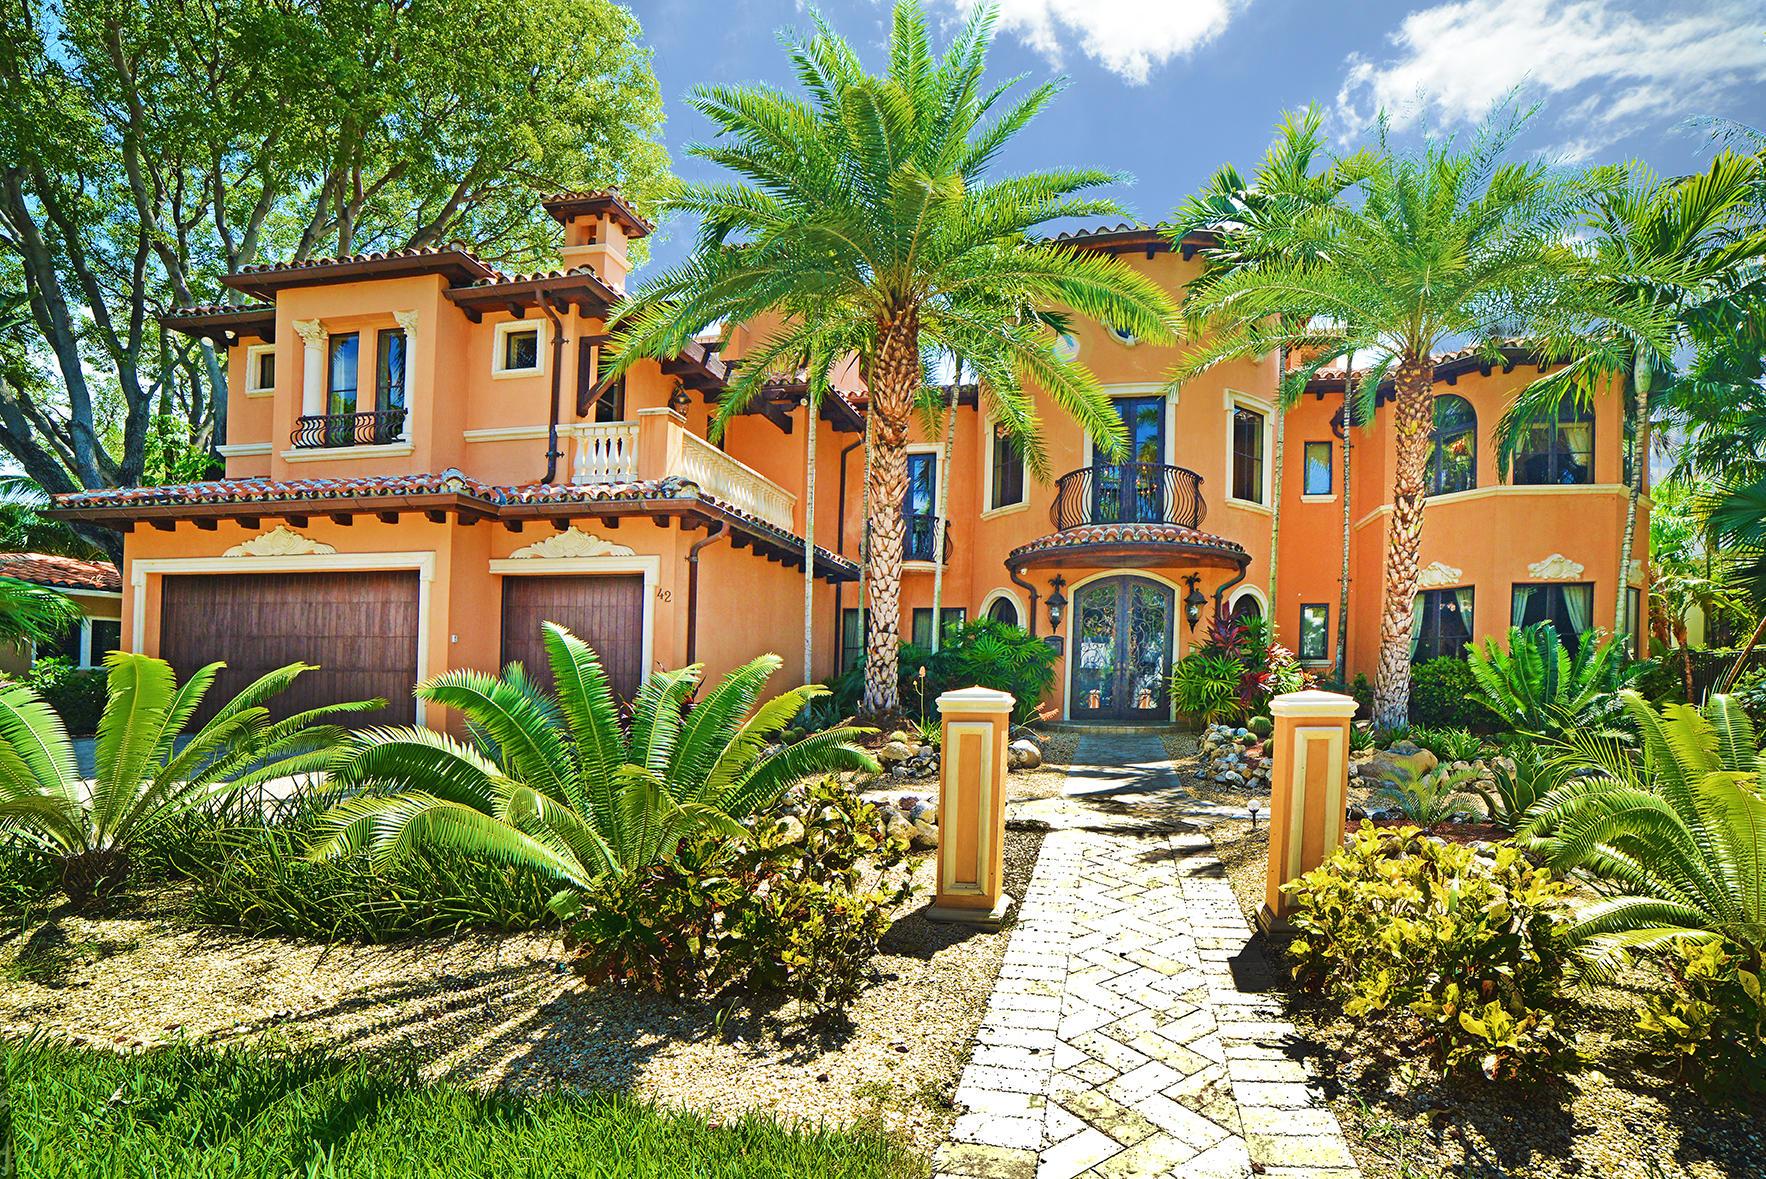 Photo of 42 Nurmi Drive Drive, Fort Lauderdale, FL 33301